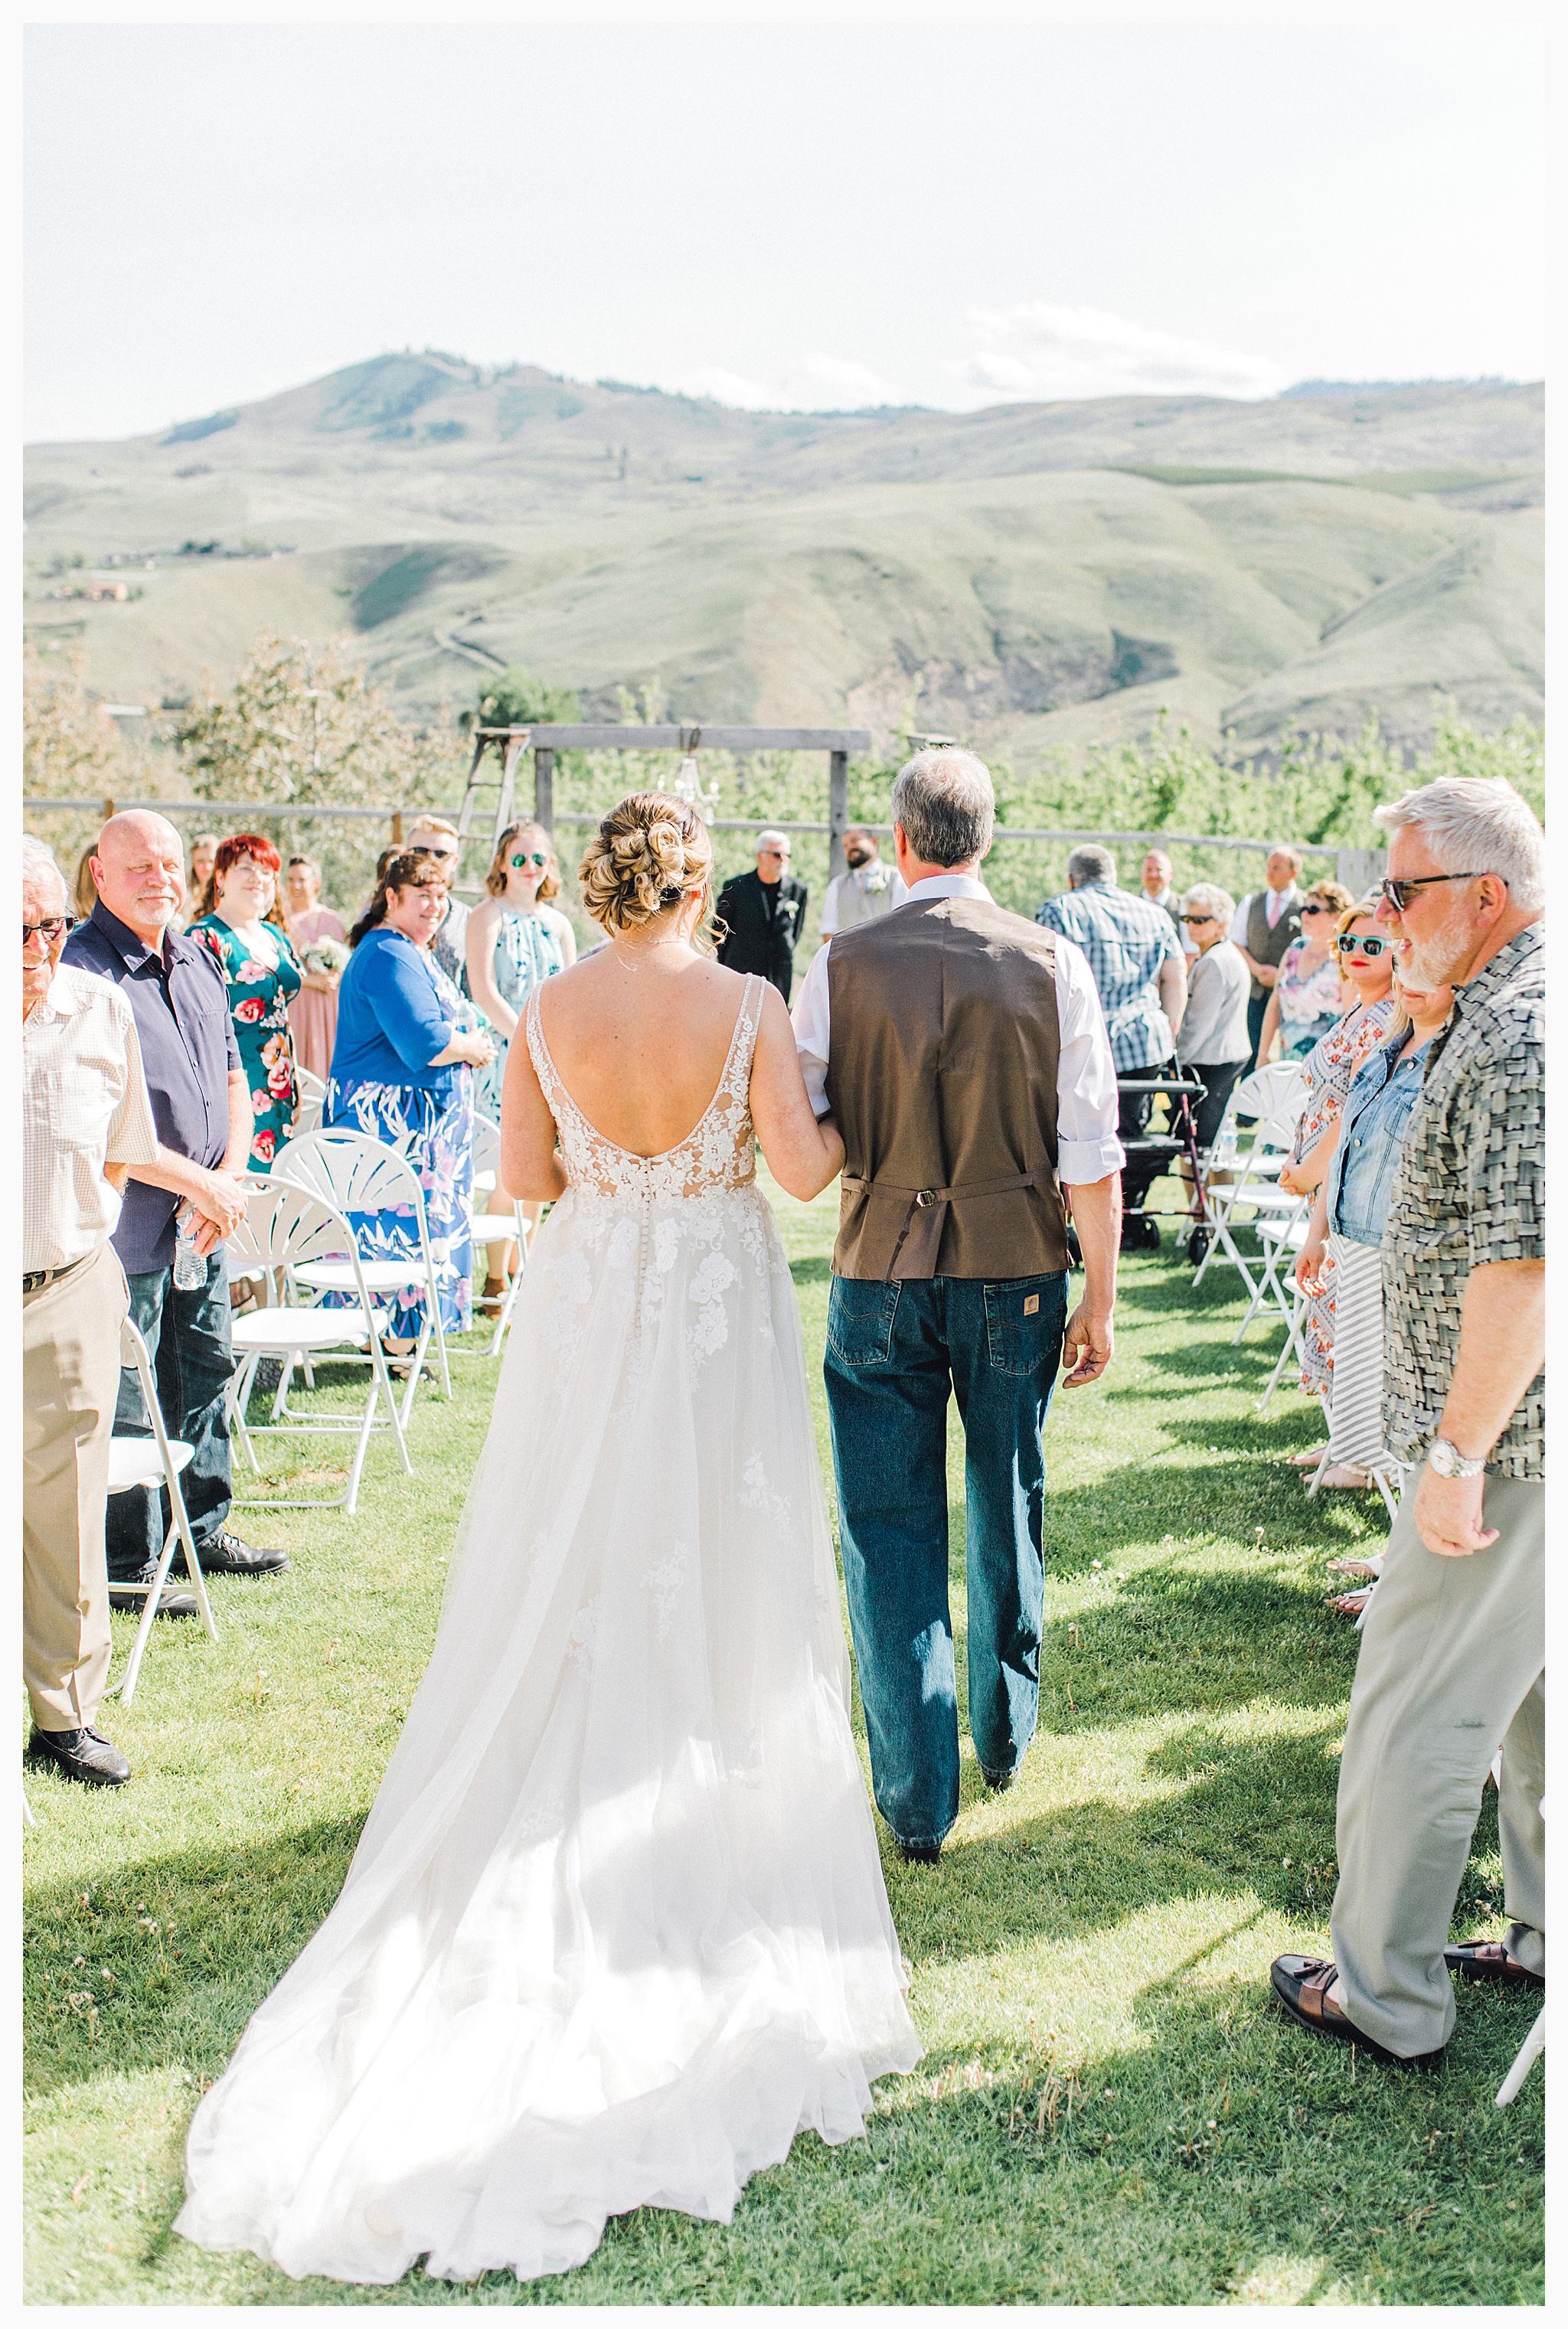 Rustic barn wedding in Wenatchee Washington at Sunshine Ranch on Easy Street, Emma Rose Company Seattle PNW Light and Airy Wedding Photographer_0060.jpg